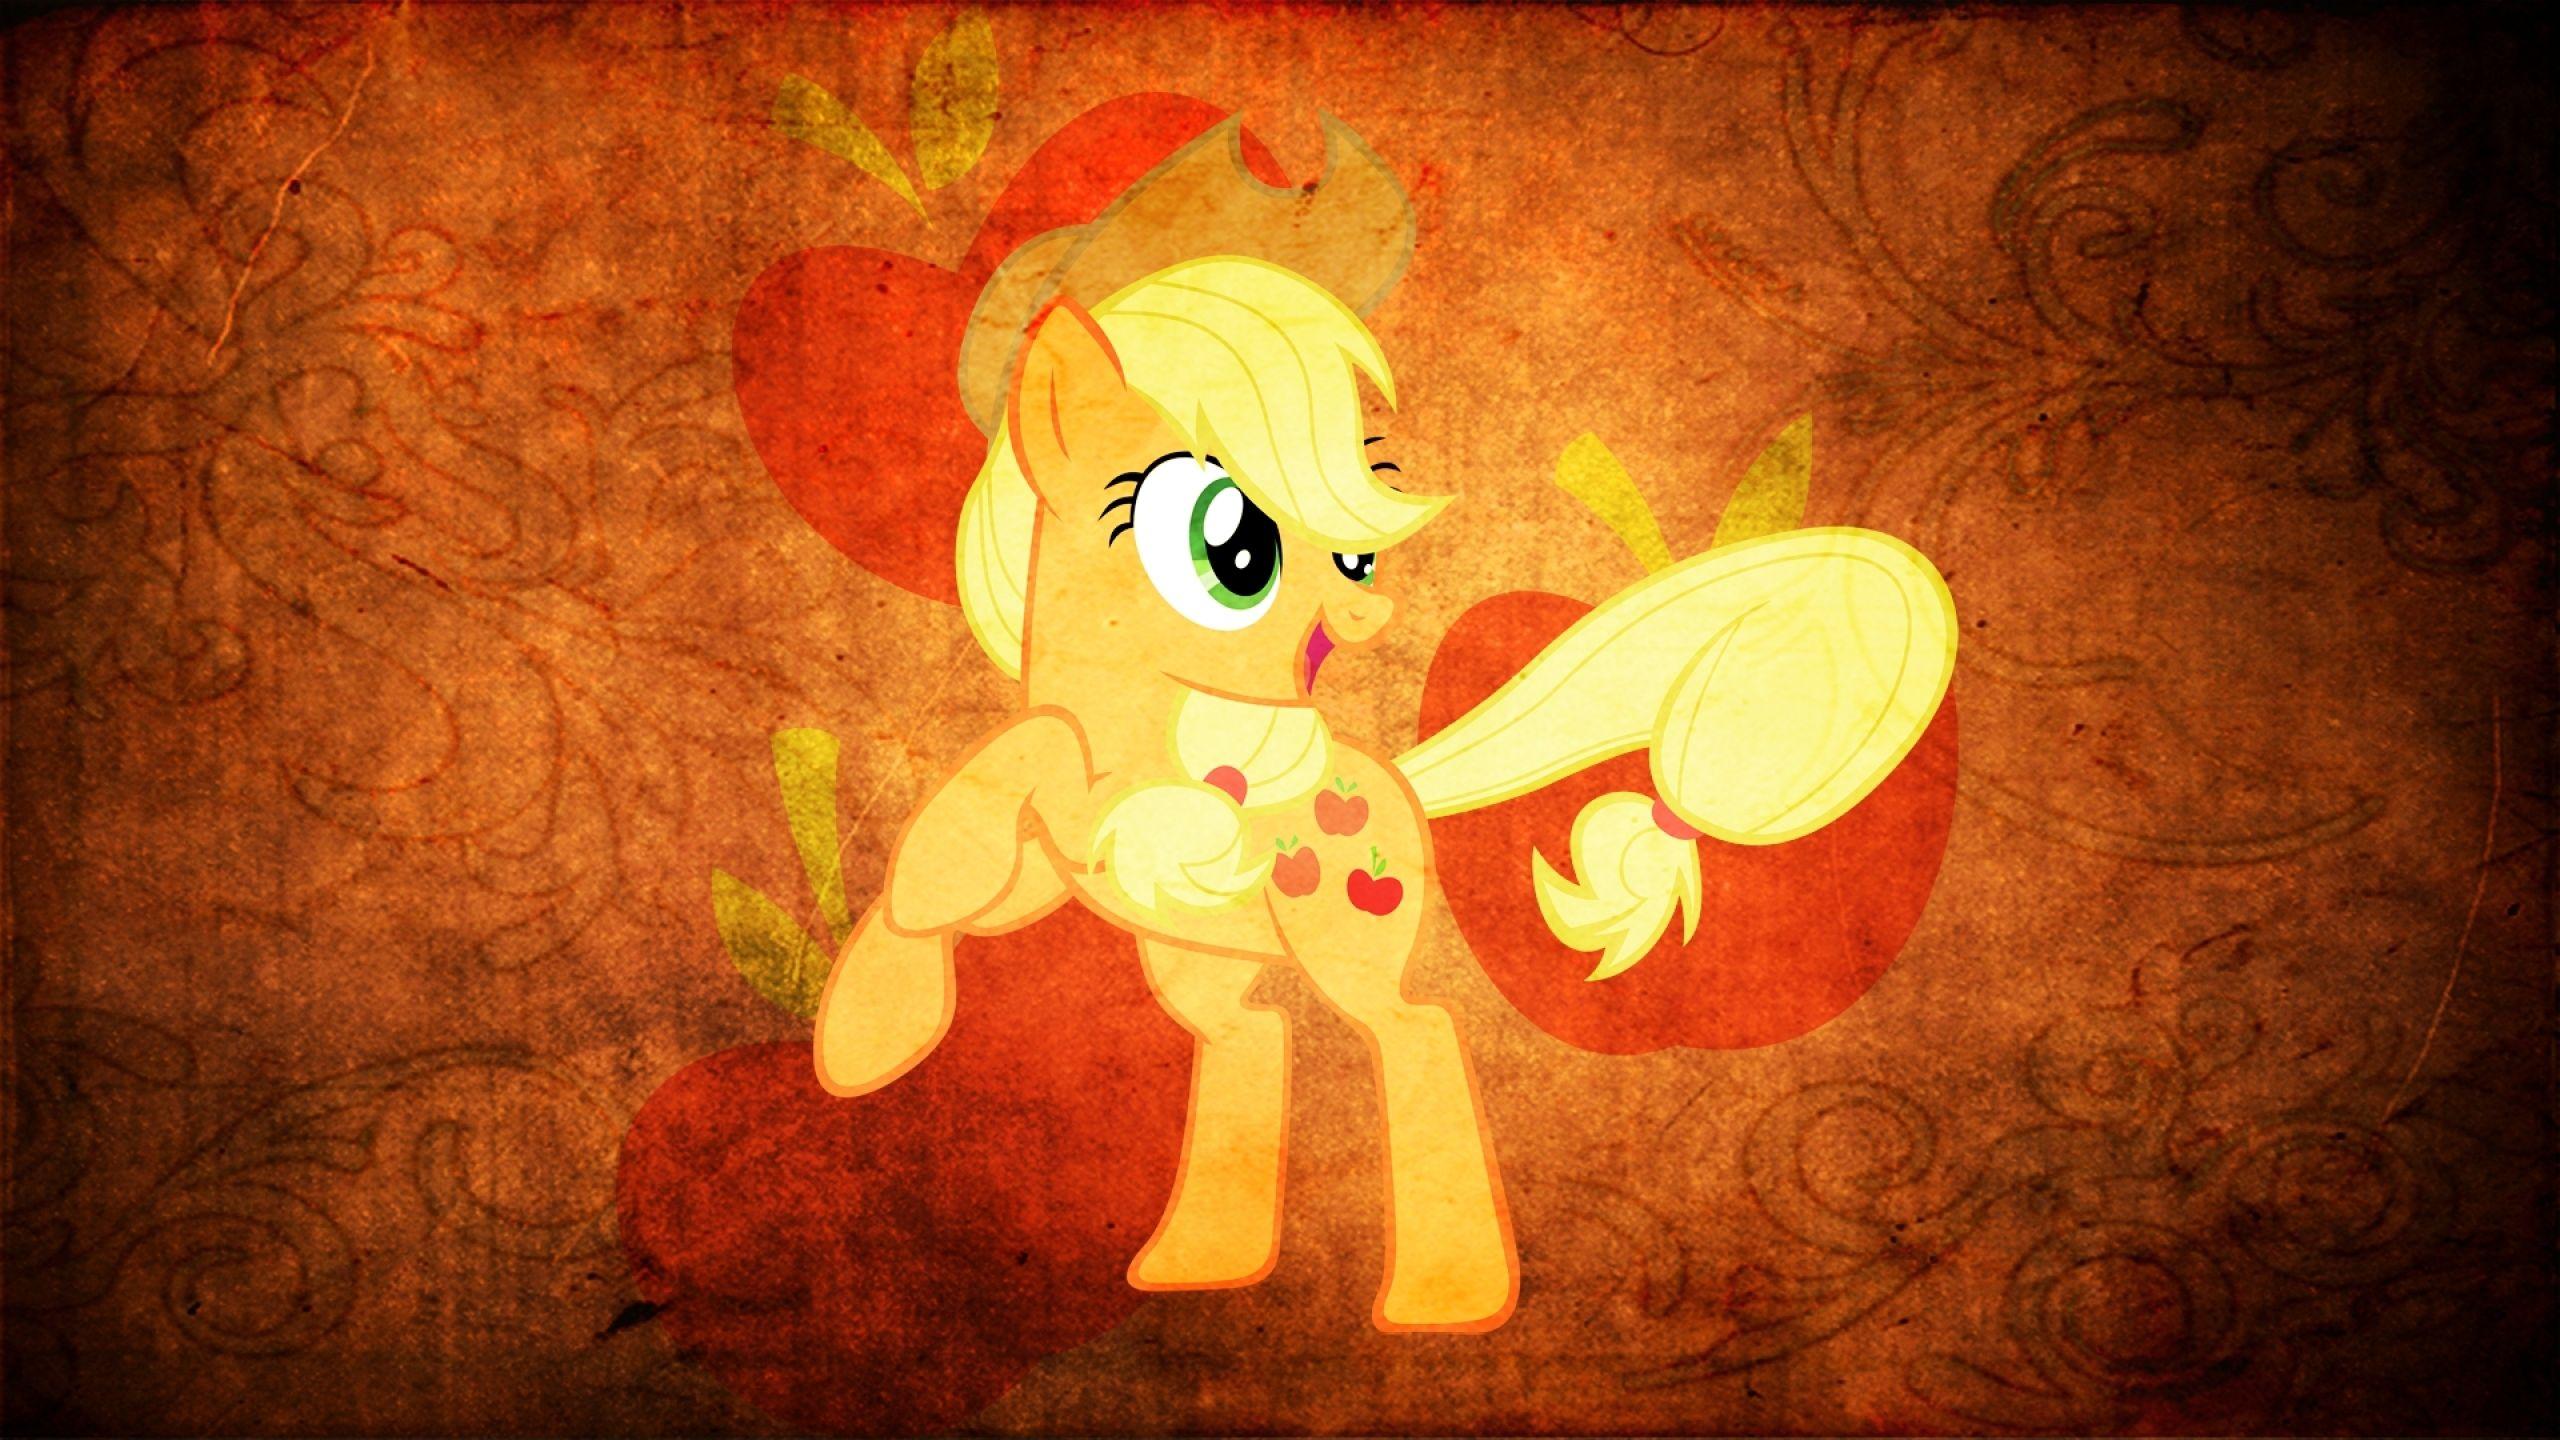 Pin By Ramsey On Mlp My Little Pony Friendship Is Magic My Little Pony Applejack My Little Pony Unicorn My Little Pony Wallpaper